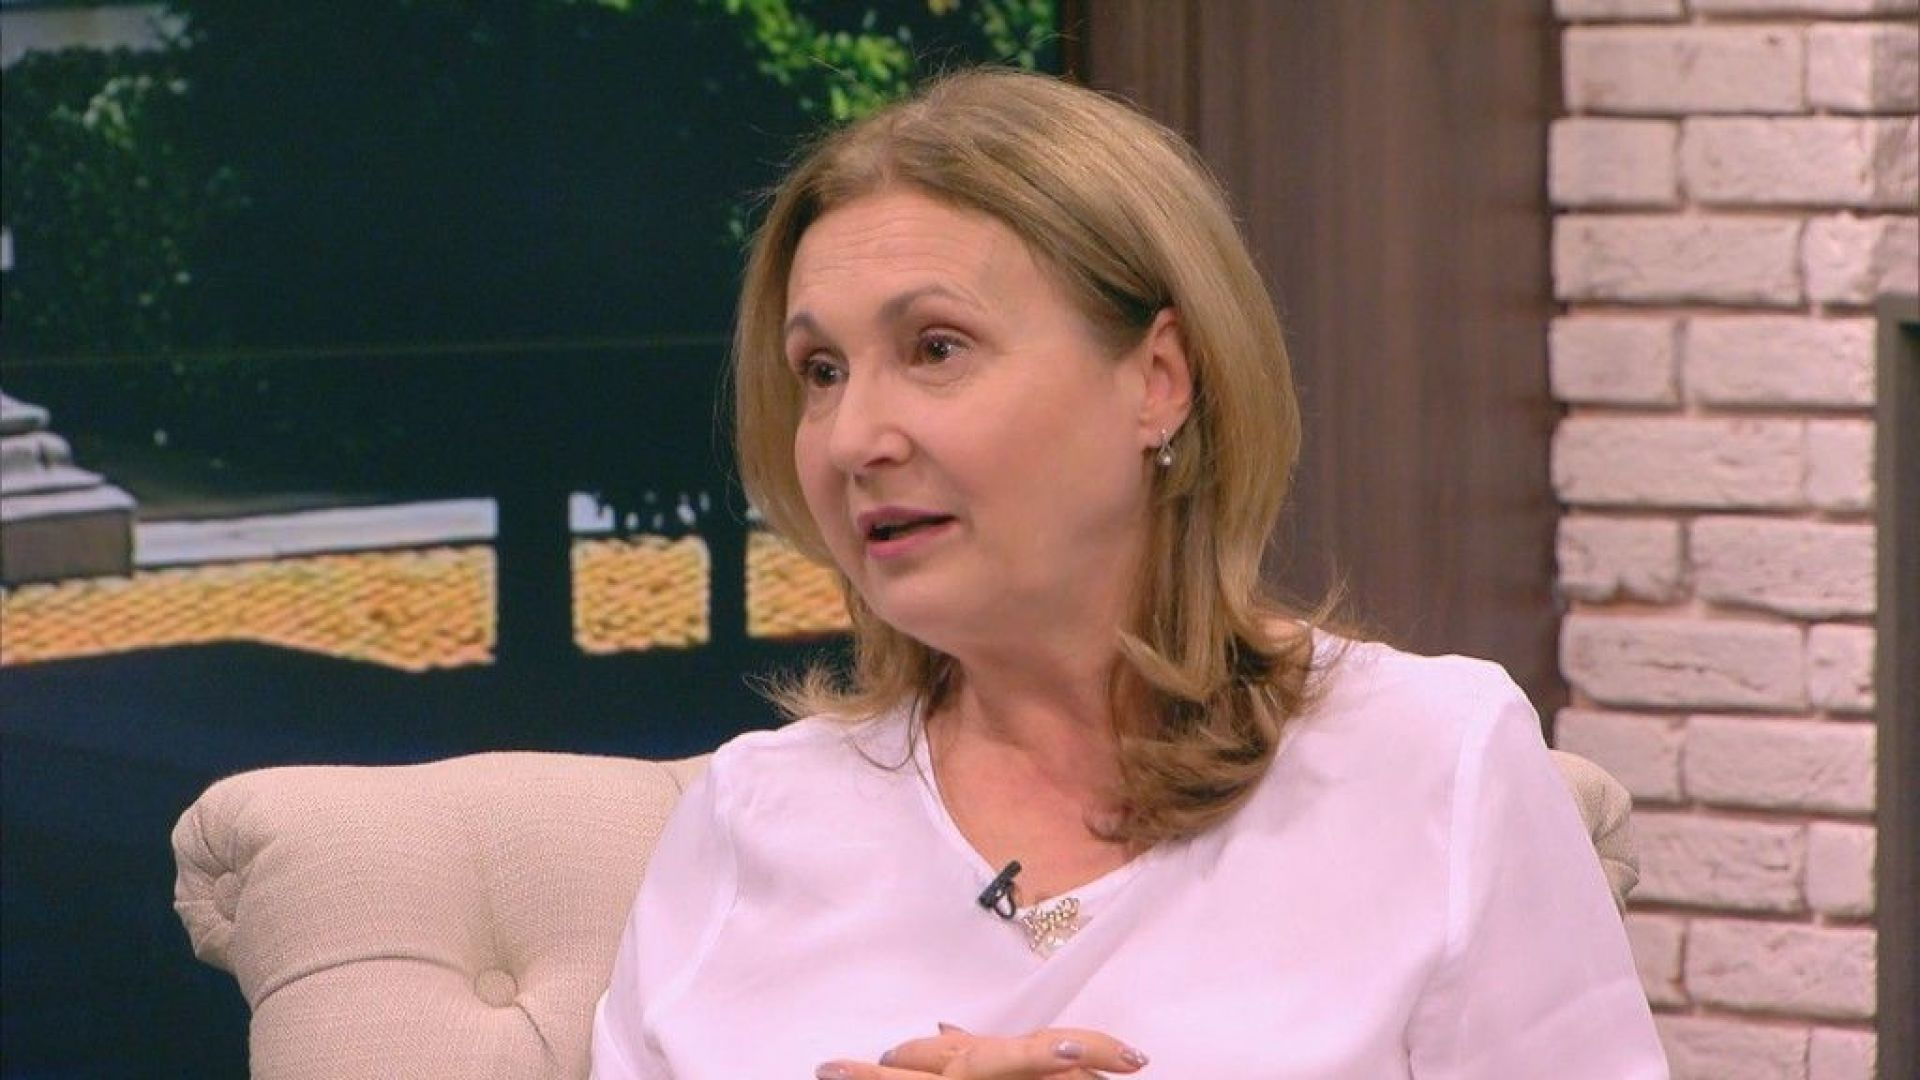 Румяна Бъчварова отива посланик в Израел, Марин Райков - в Лондон